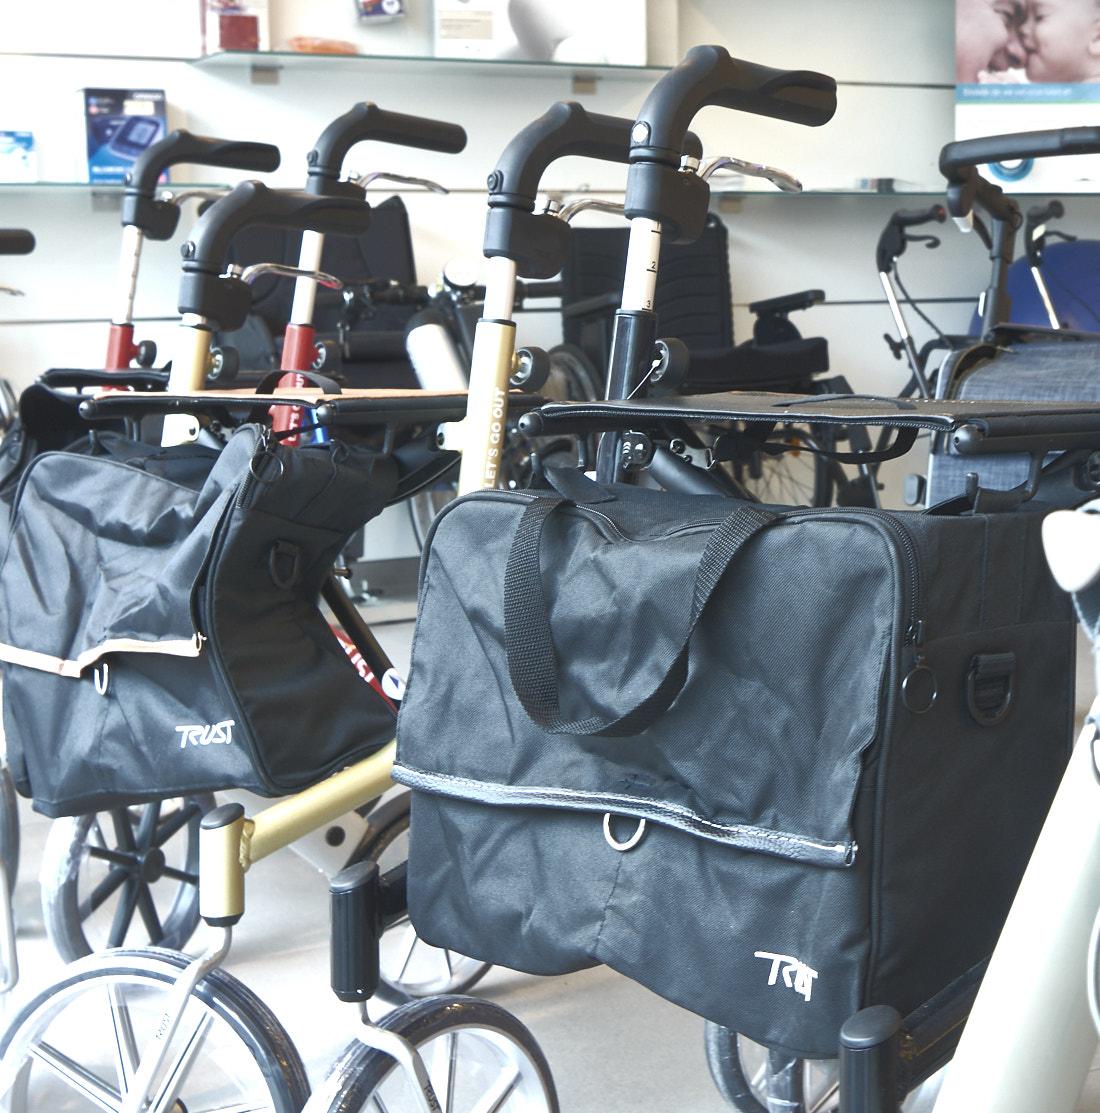 Matton OrthoMedi Mobiliteit